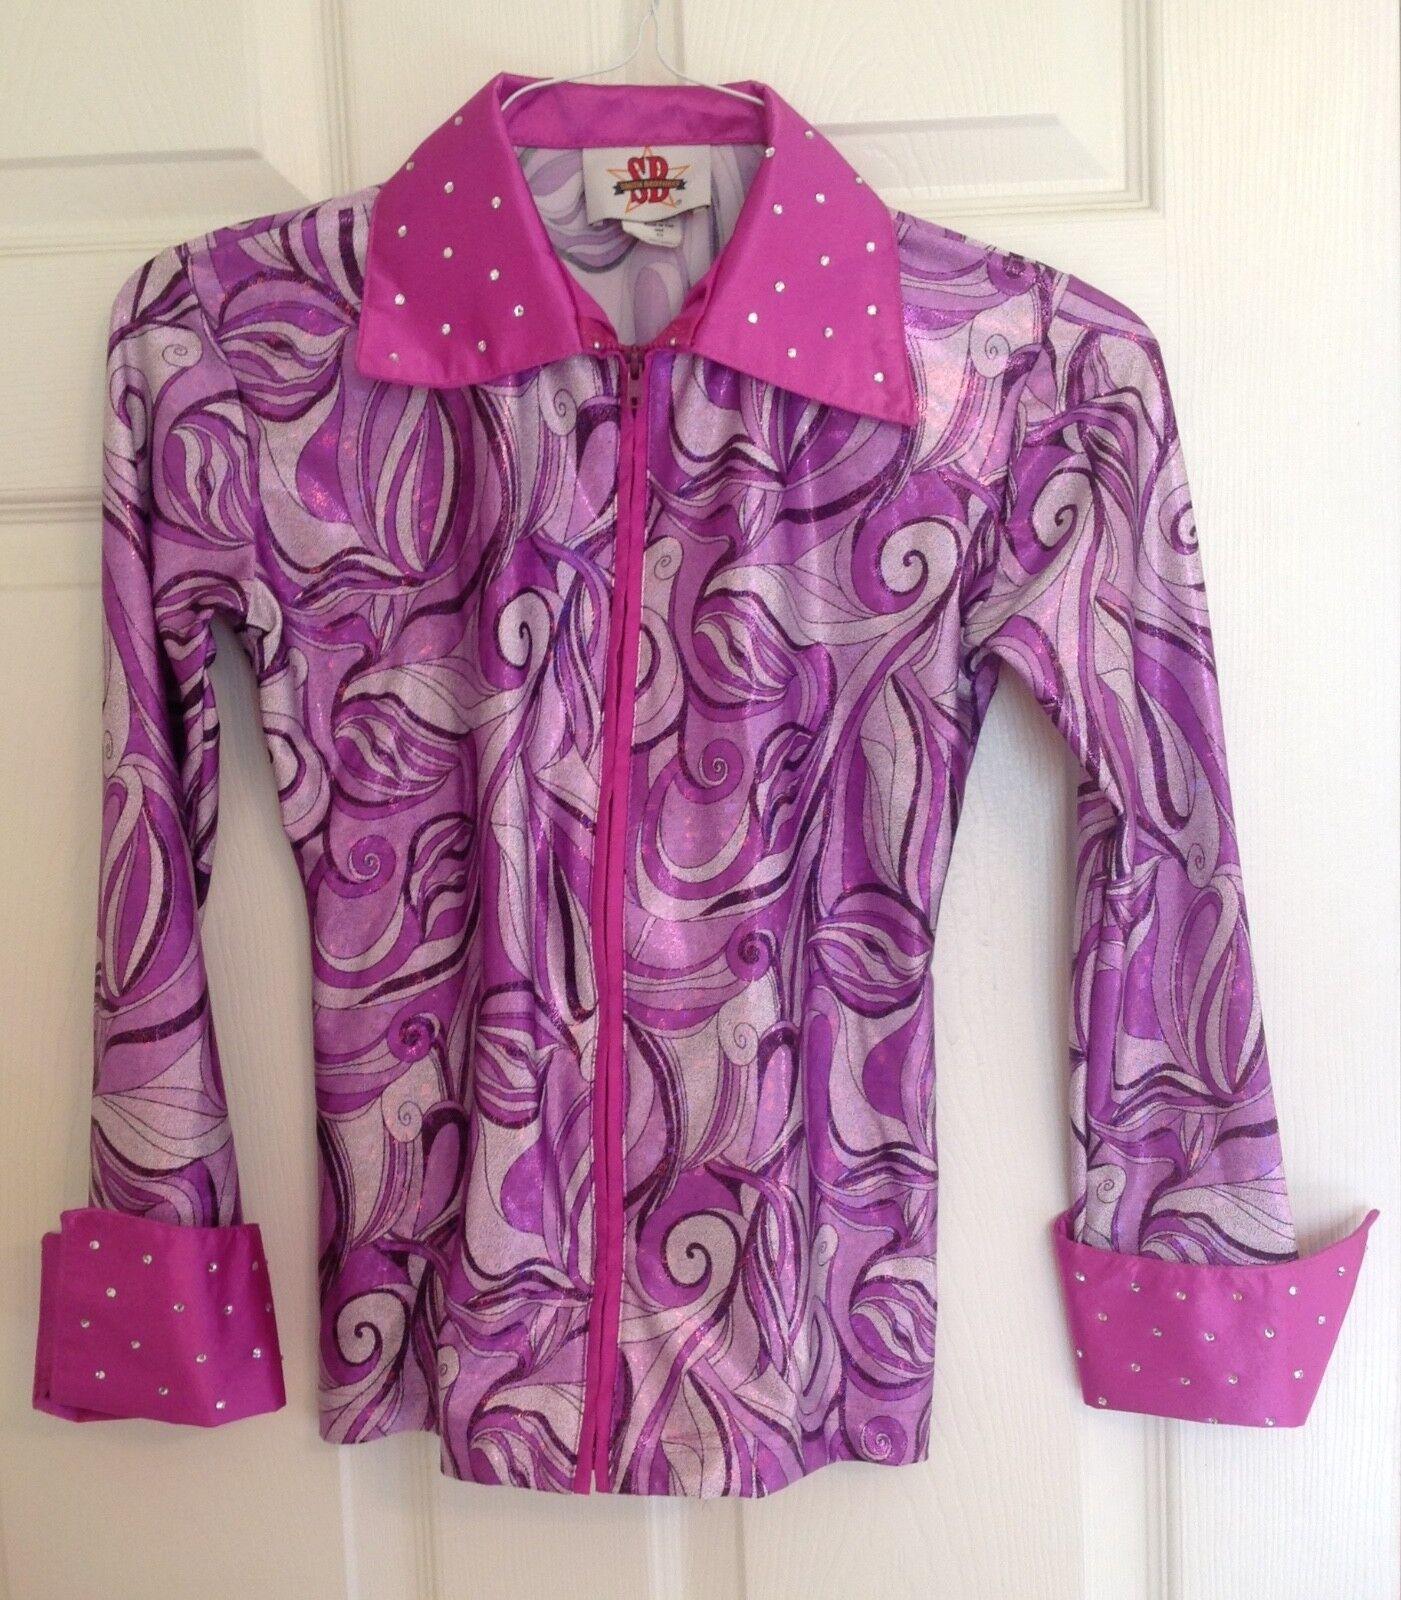 Smith Bredhers Equestrian Show Shirt  Purple Swirl W Rhinestones Women's XS NWOT  100% authentic